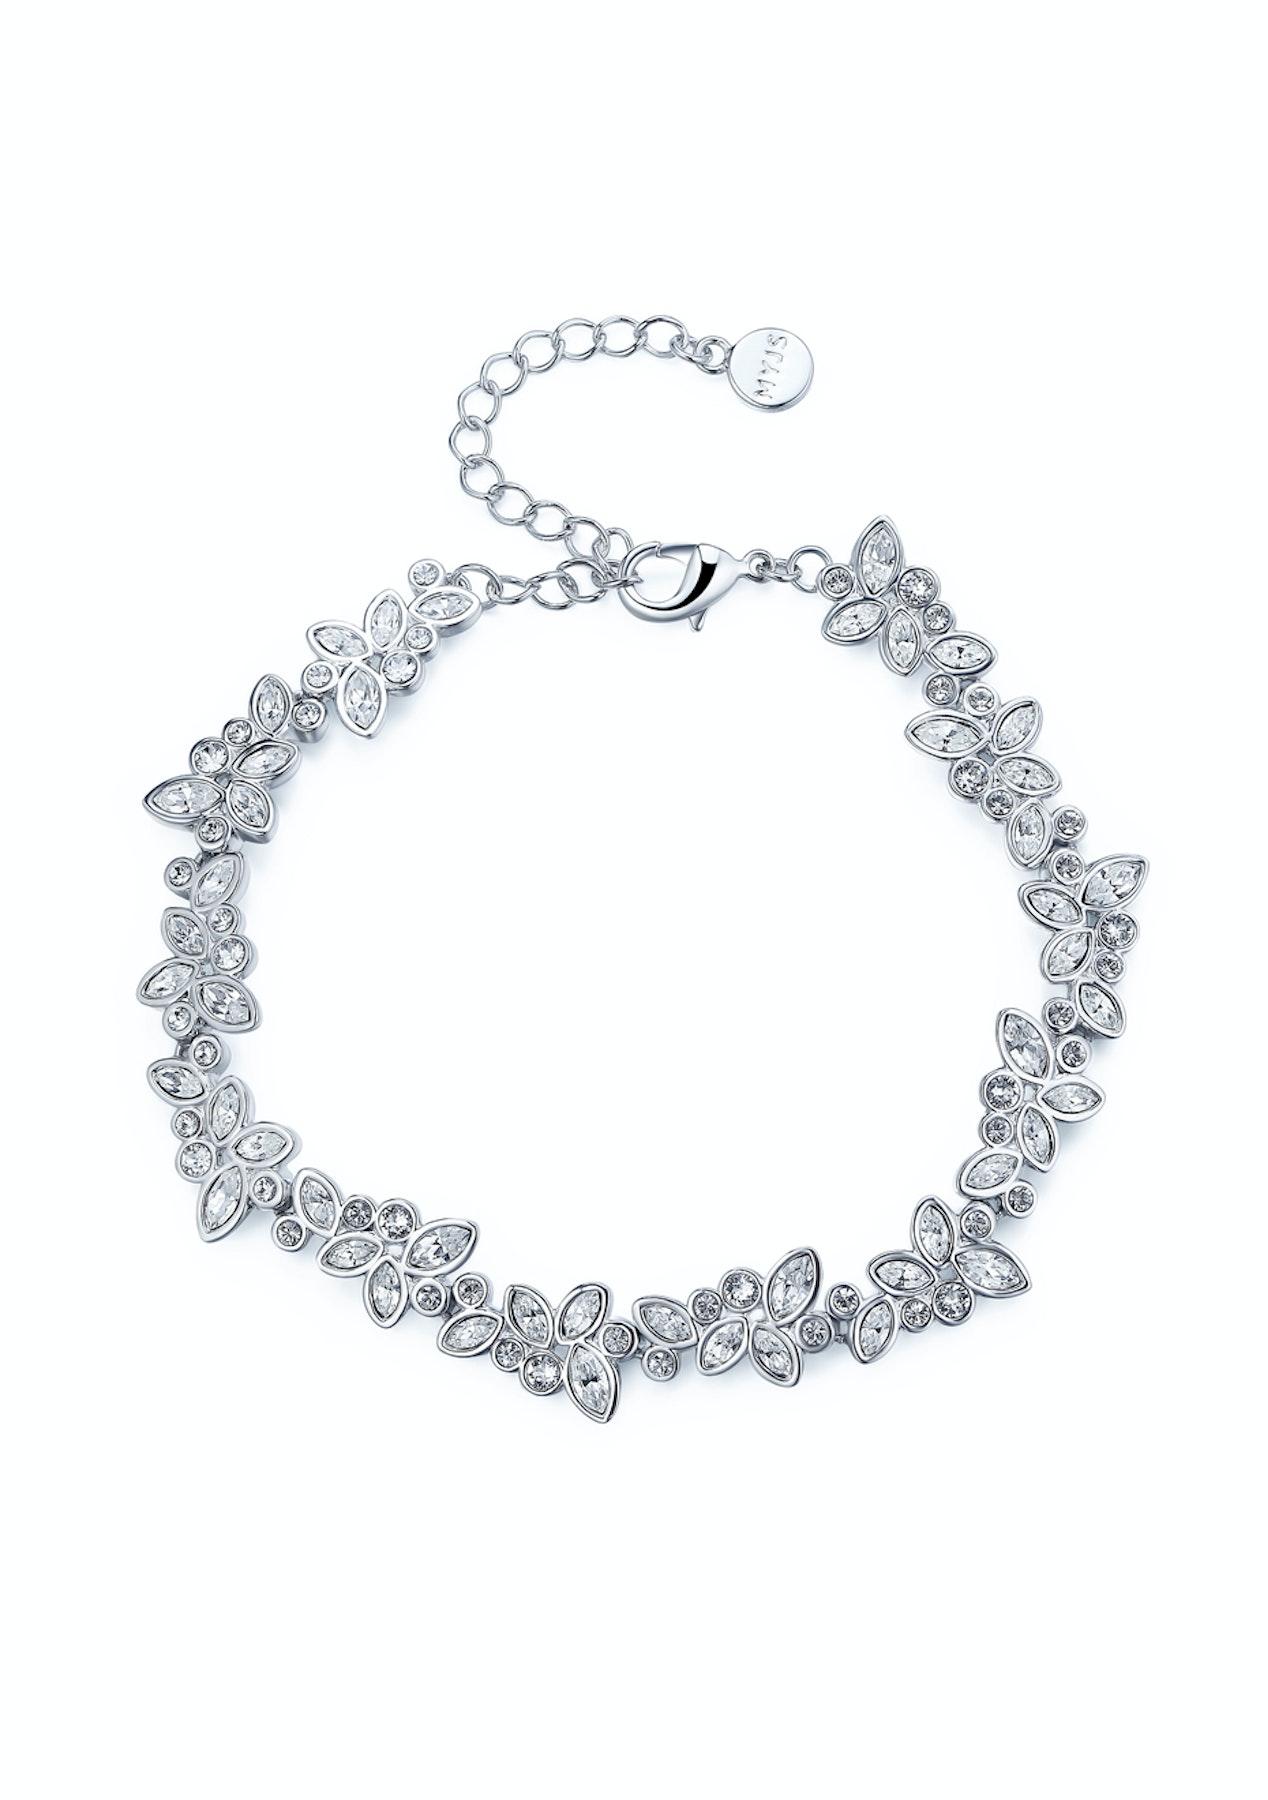 828eab25d4e6 Krystal Cotoure - Diapason Enchanted Bracelet with Swarovski Crystals WGP  MYJS - My Jewellery Store Swarovski Elements Jewellery Under  40 - Onceit